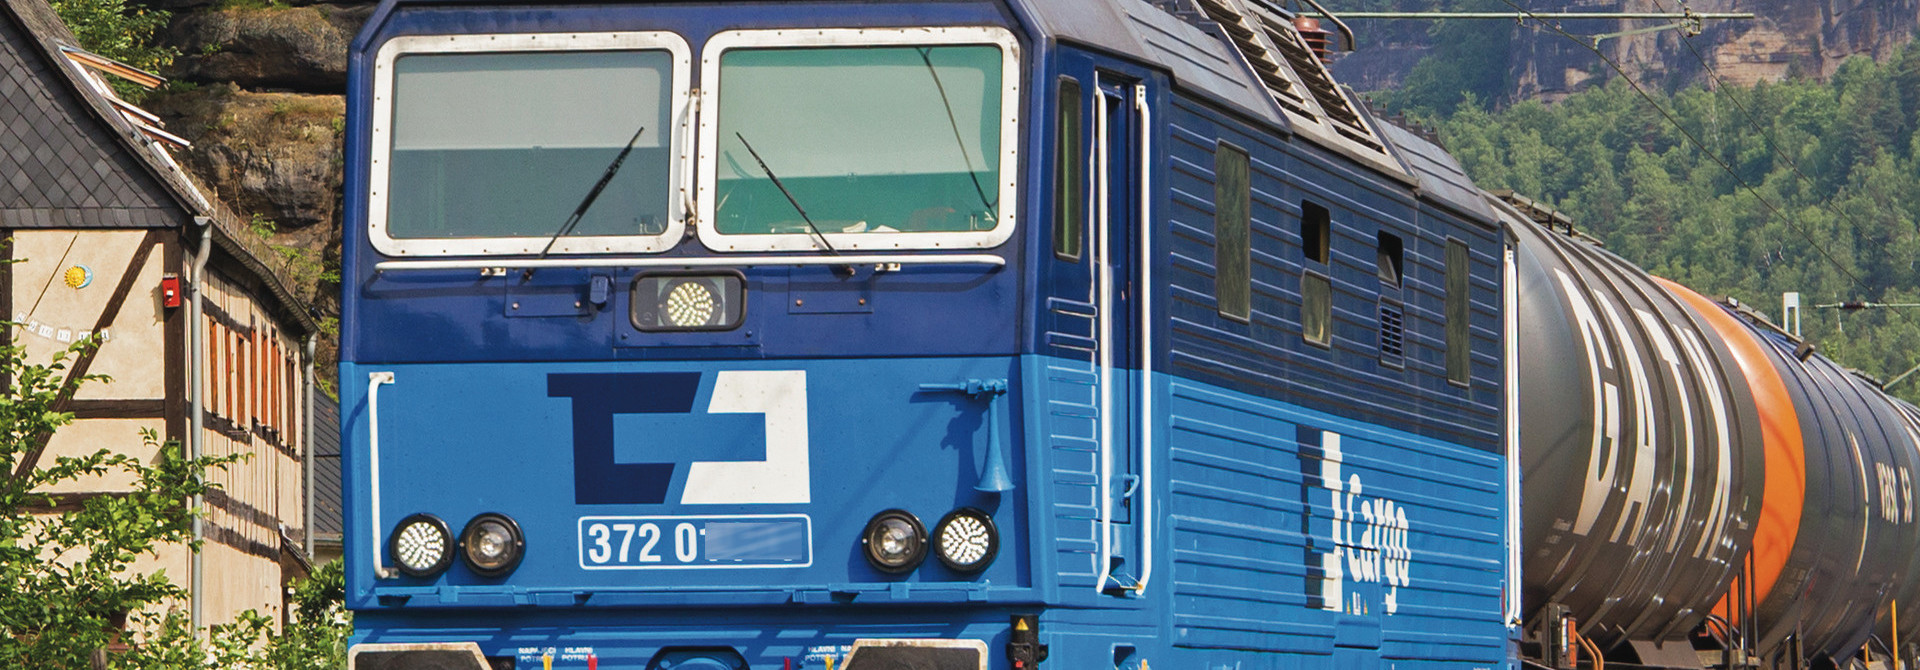 71225 E-Lok Rh 372 CD Cargo